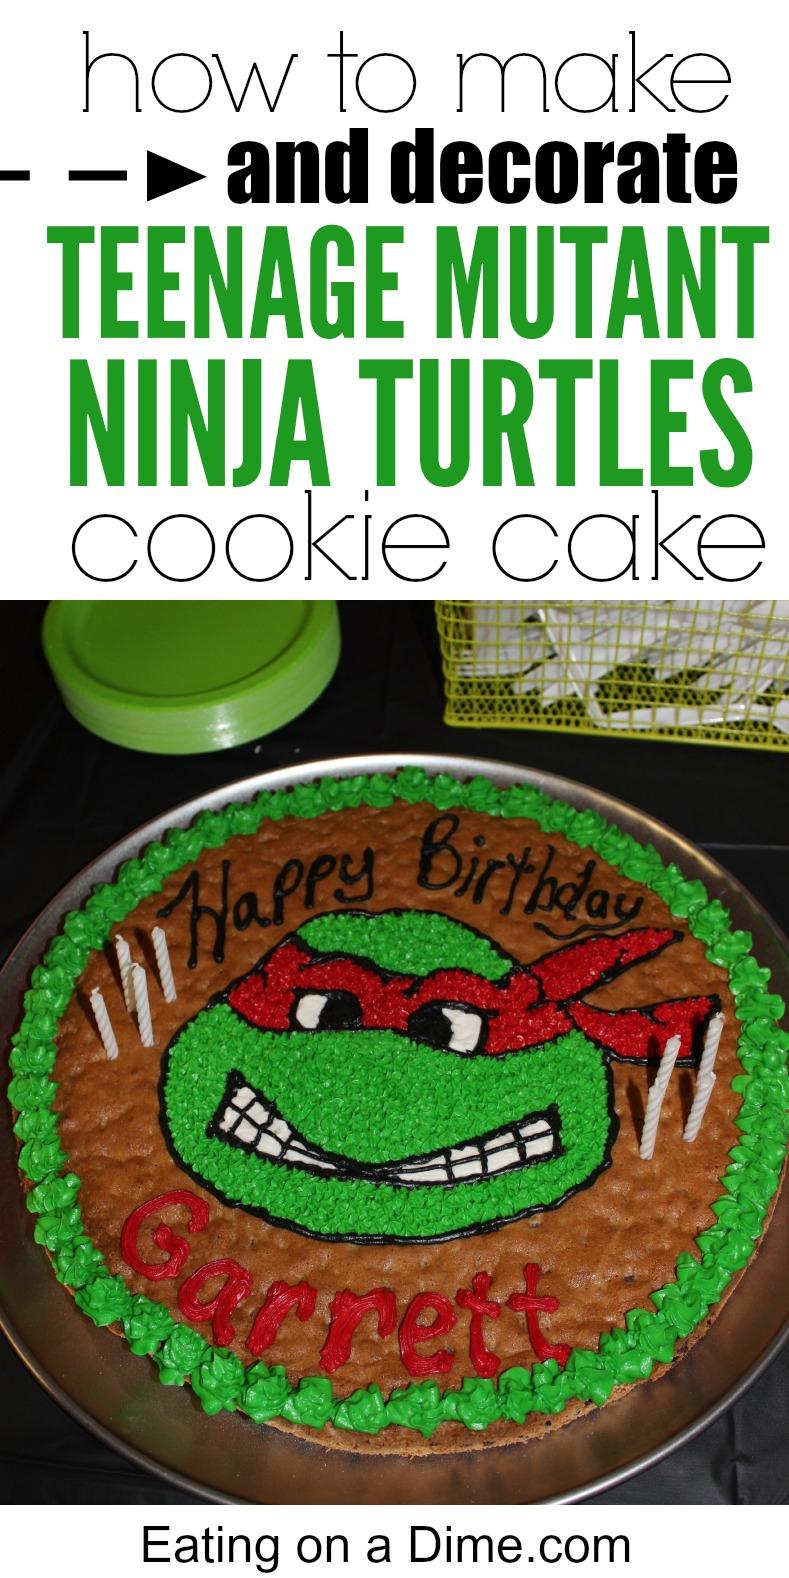 Surprising Easy To Make Ninja Turtle Cookie Cake Eating On A Dime Personalised Birthday Cards Petedlily Jamesorg